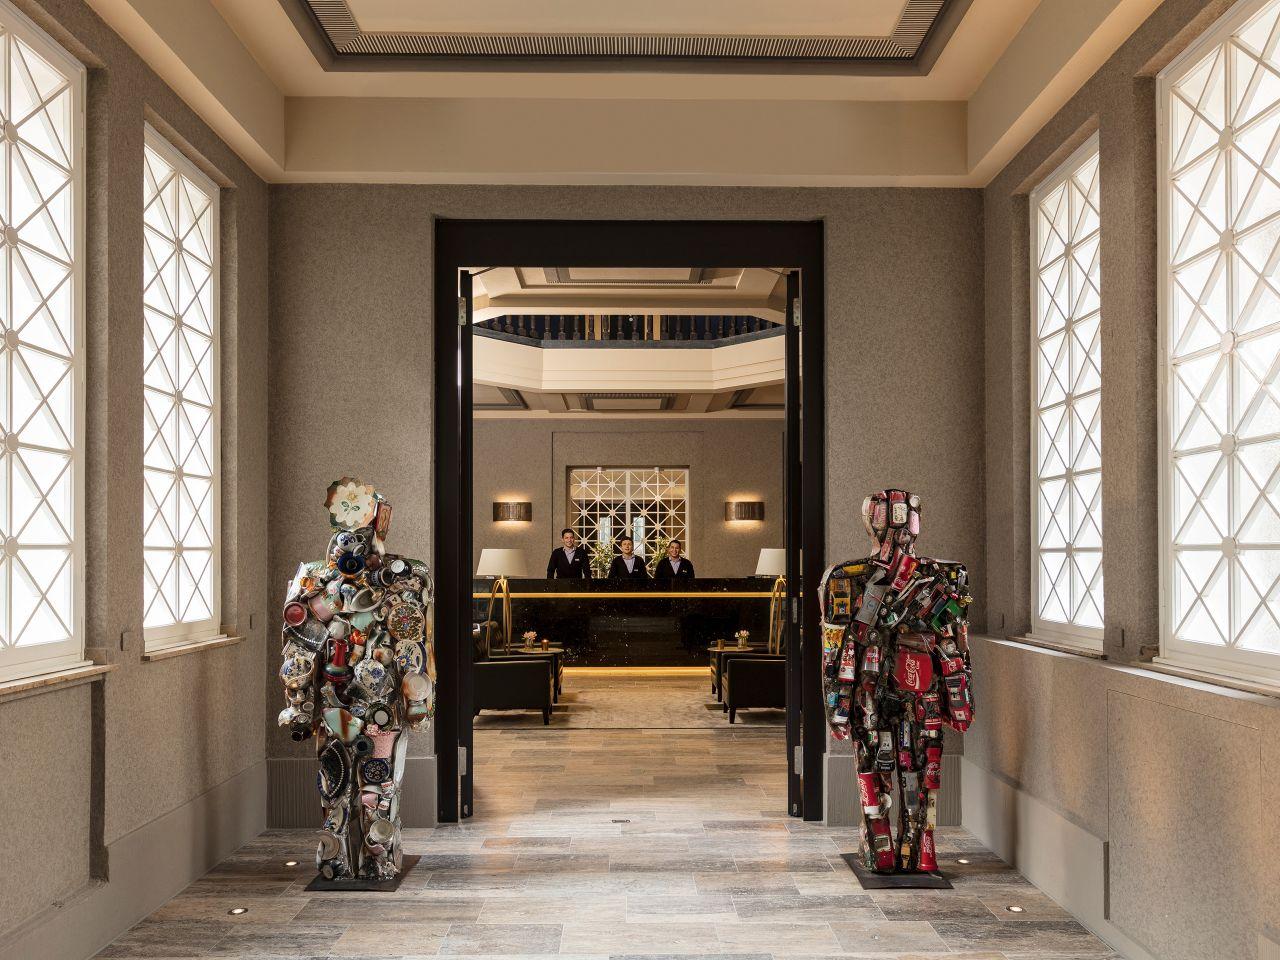 Hyatt House dusseldorf lobby